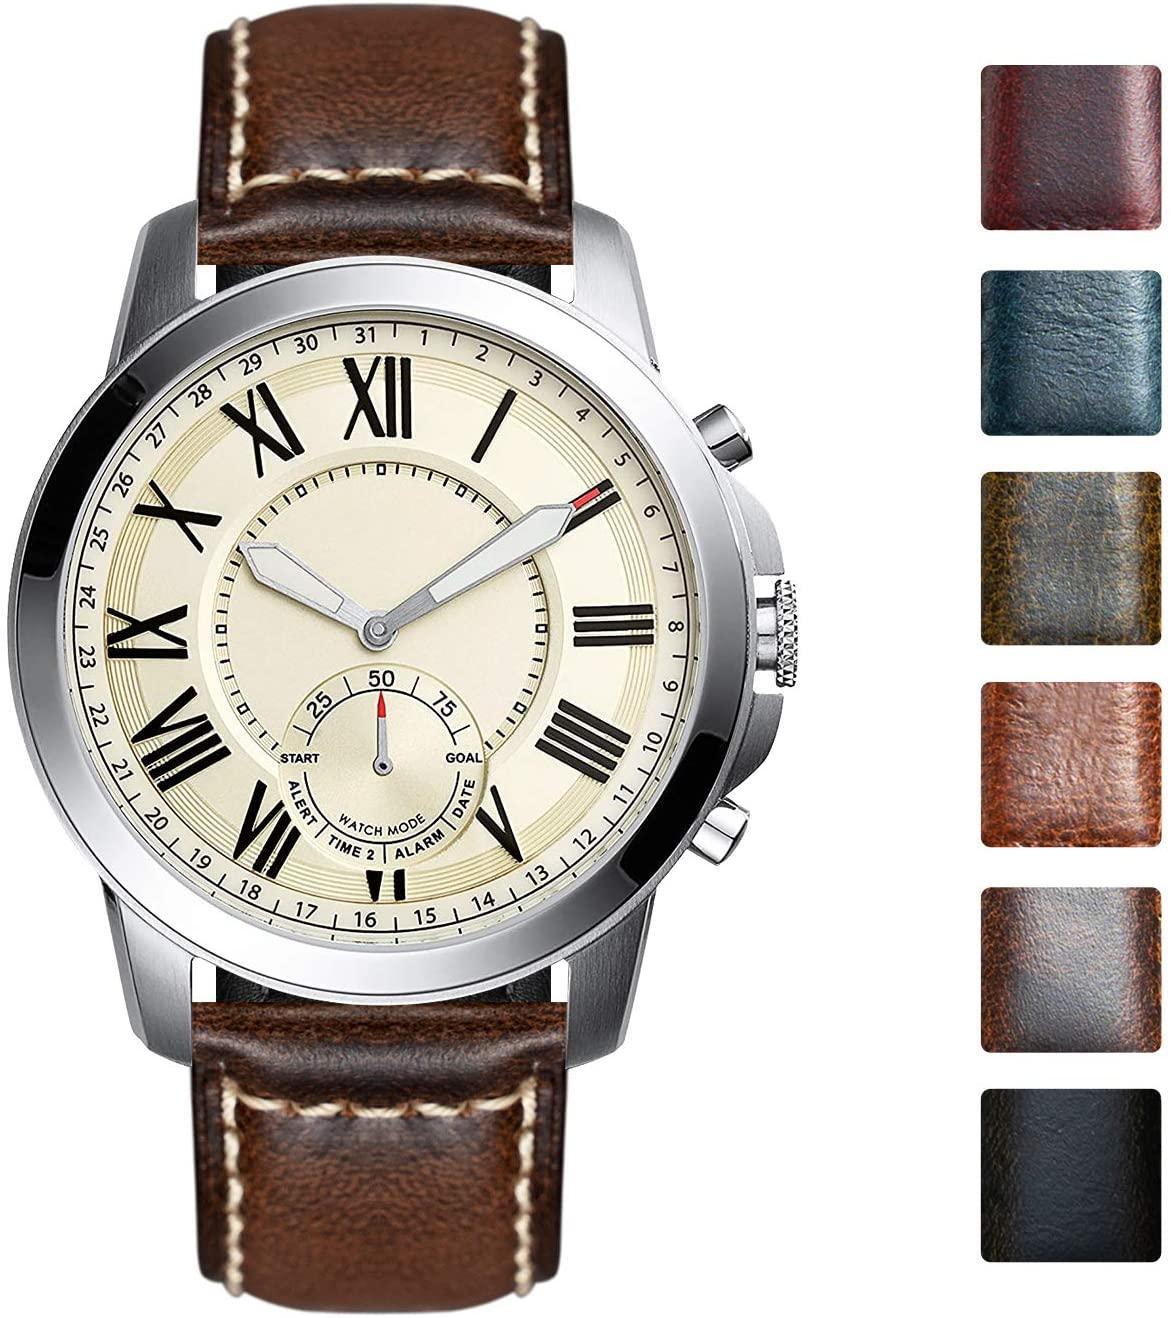 Watch Band Compatible with Fossil Q Venture Gen 5 Carlyle/Julianna/Gen 3 Explorist/Gen 4 Venture HR/Sport 41mm 43mm/Hybrid Smartwatch Vintage Oil Wax Leather Strap Replacement 18mm 22mm 24mm Wristband